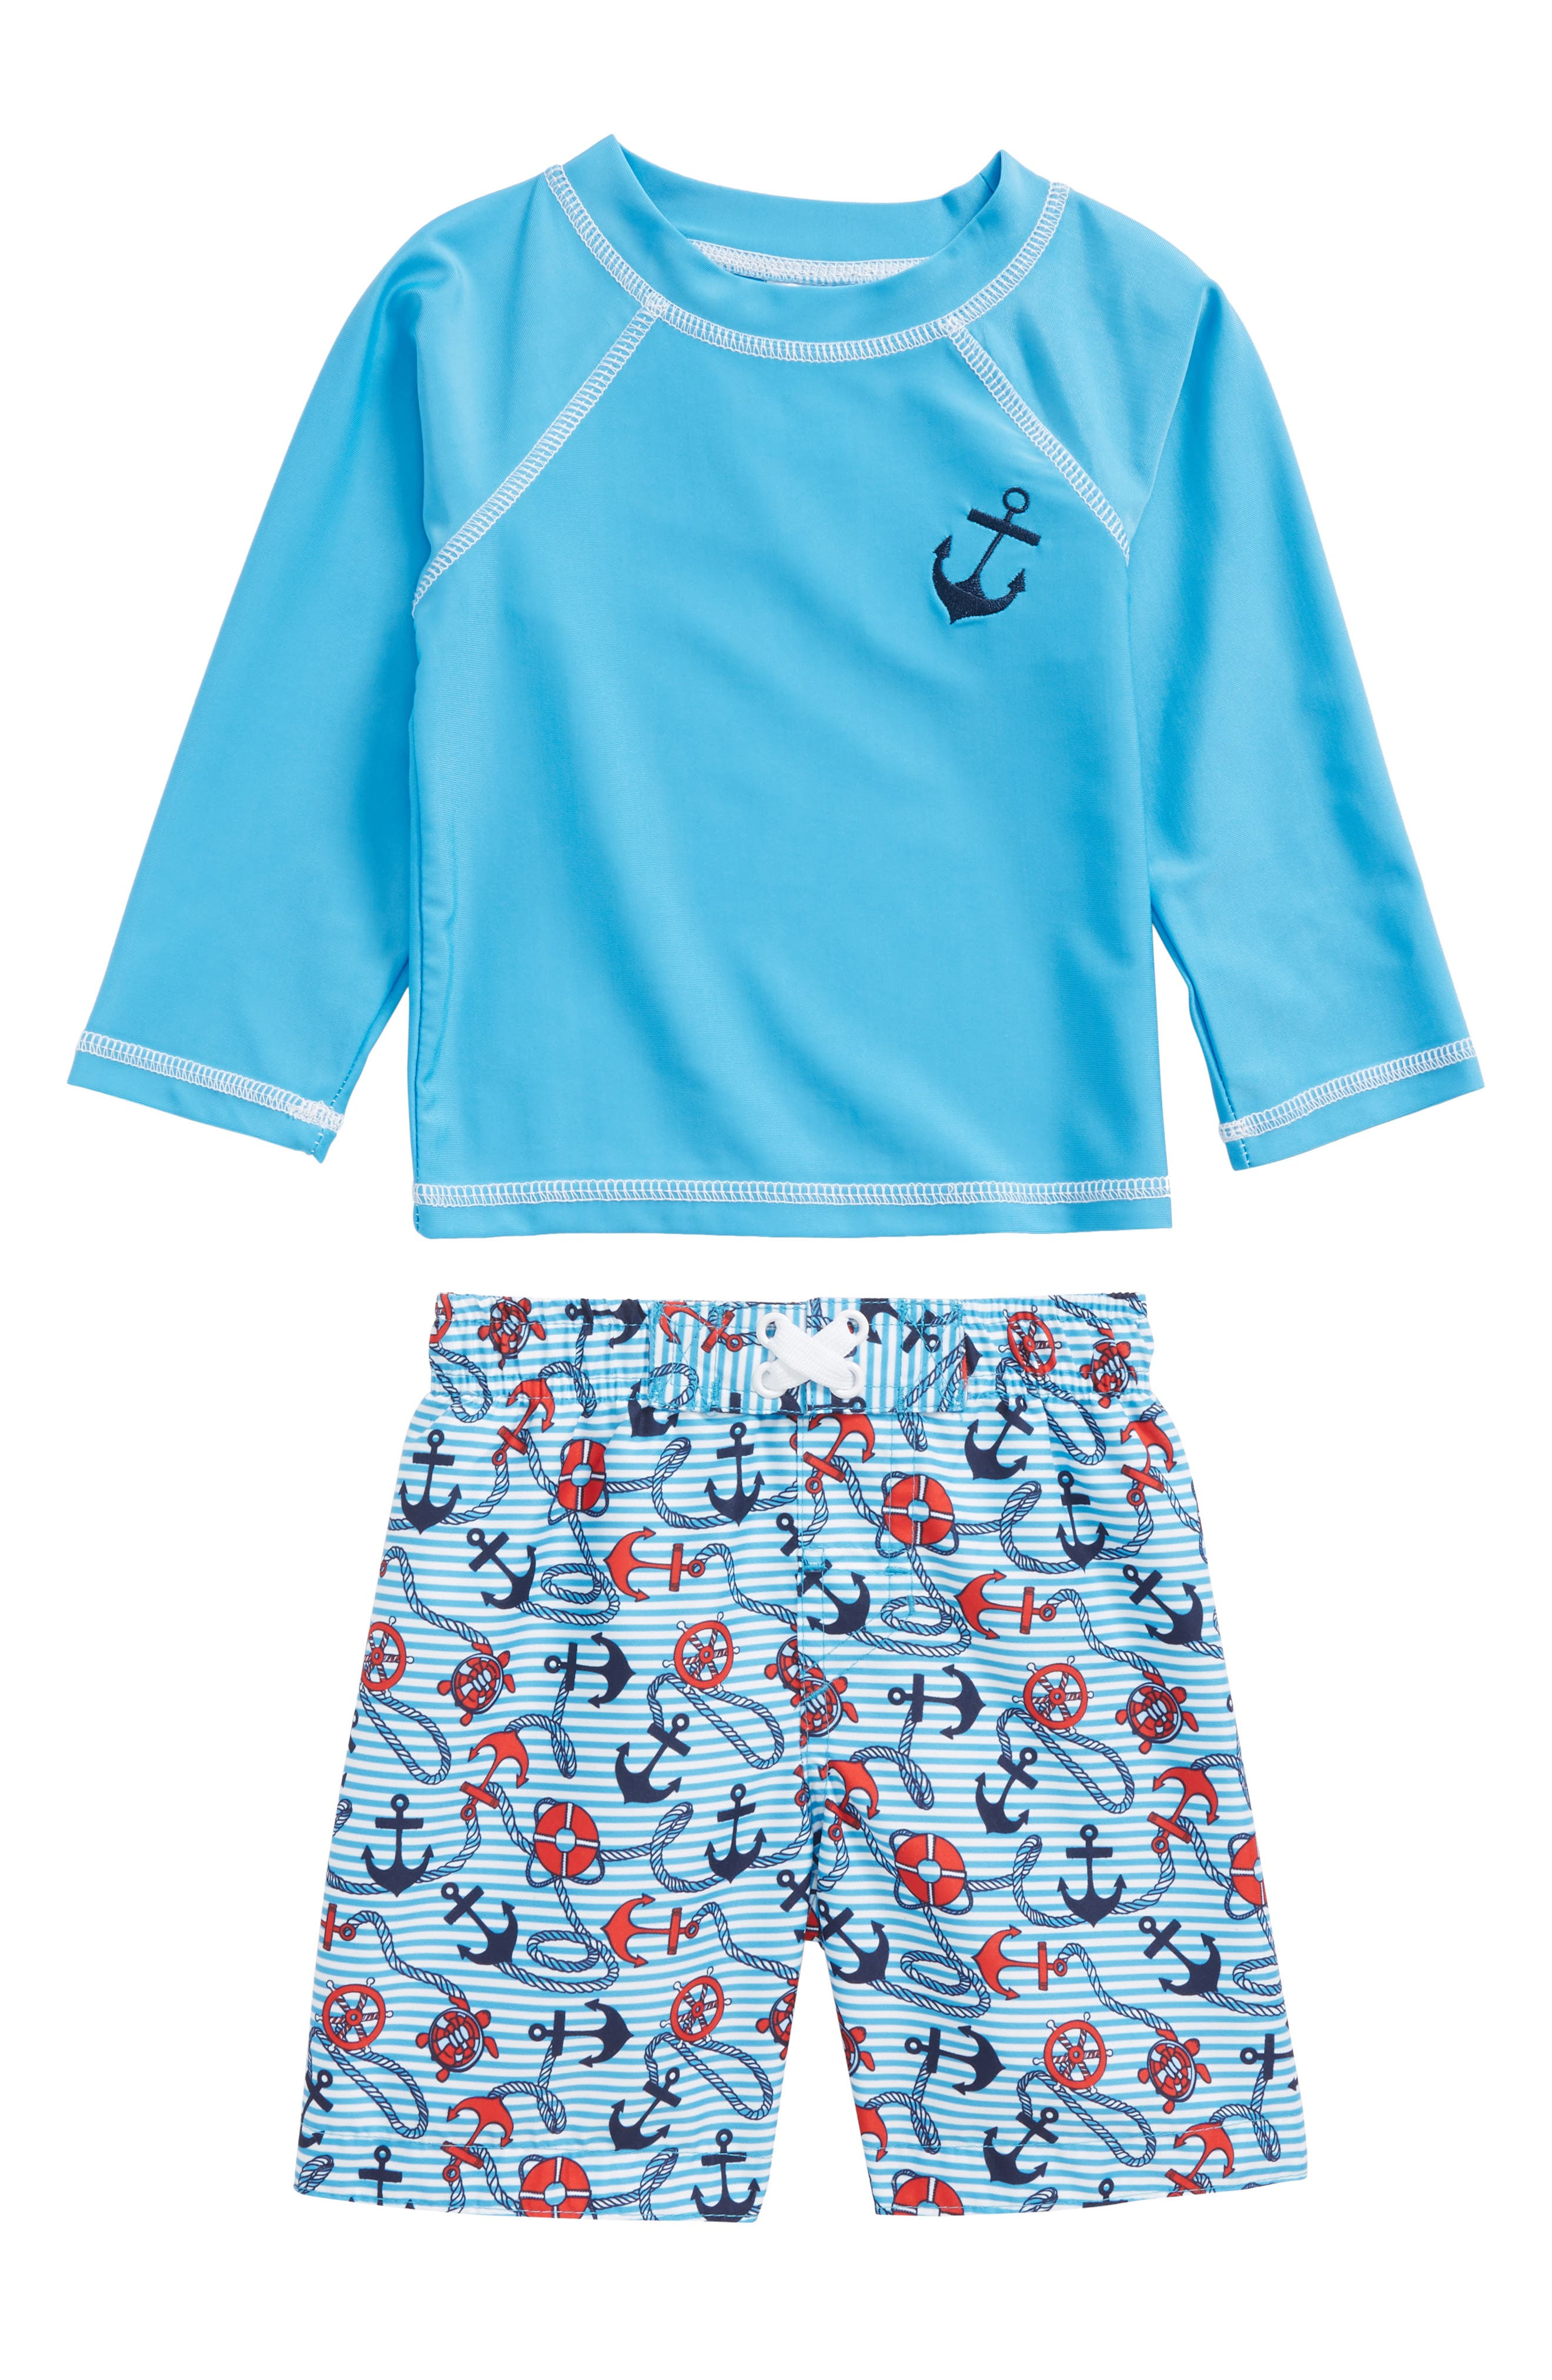 Beachy Nautical Two-Piece Rashguard Swimsuit,                             Main thumbnail 1, color,                             Blue Multi